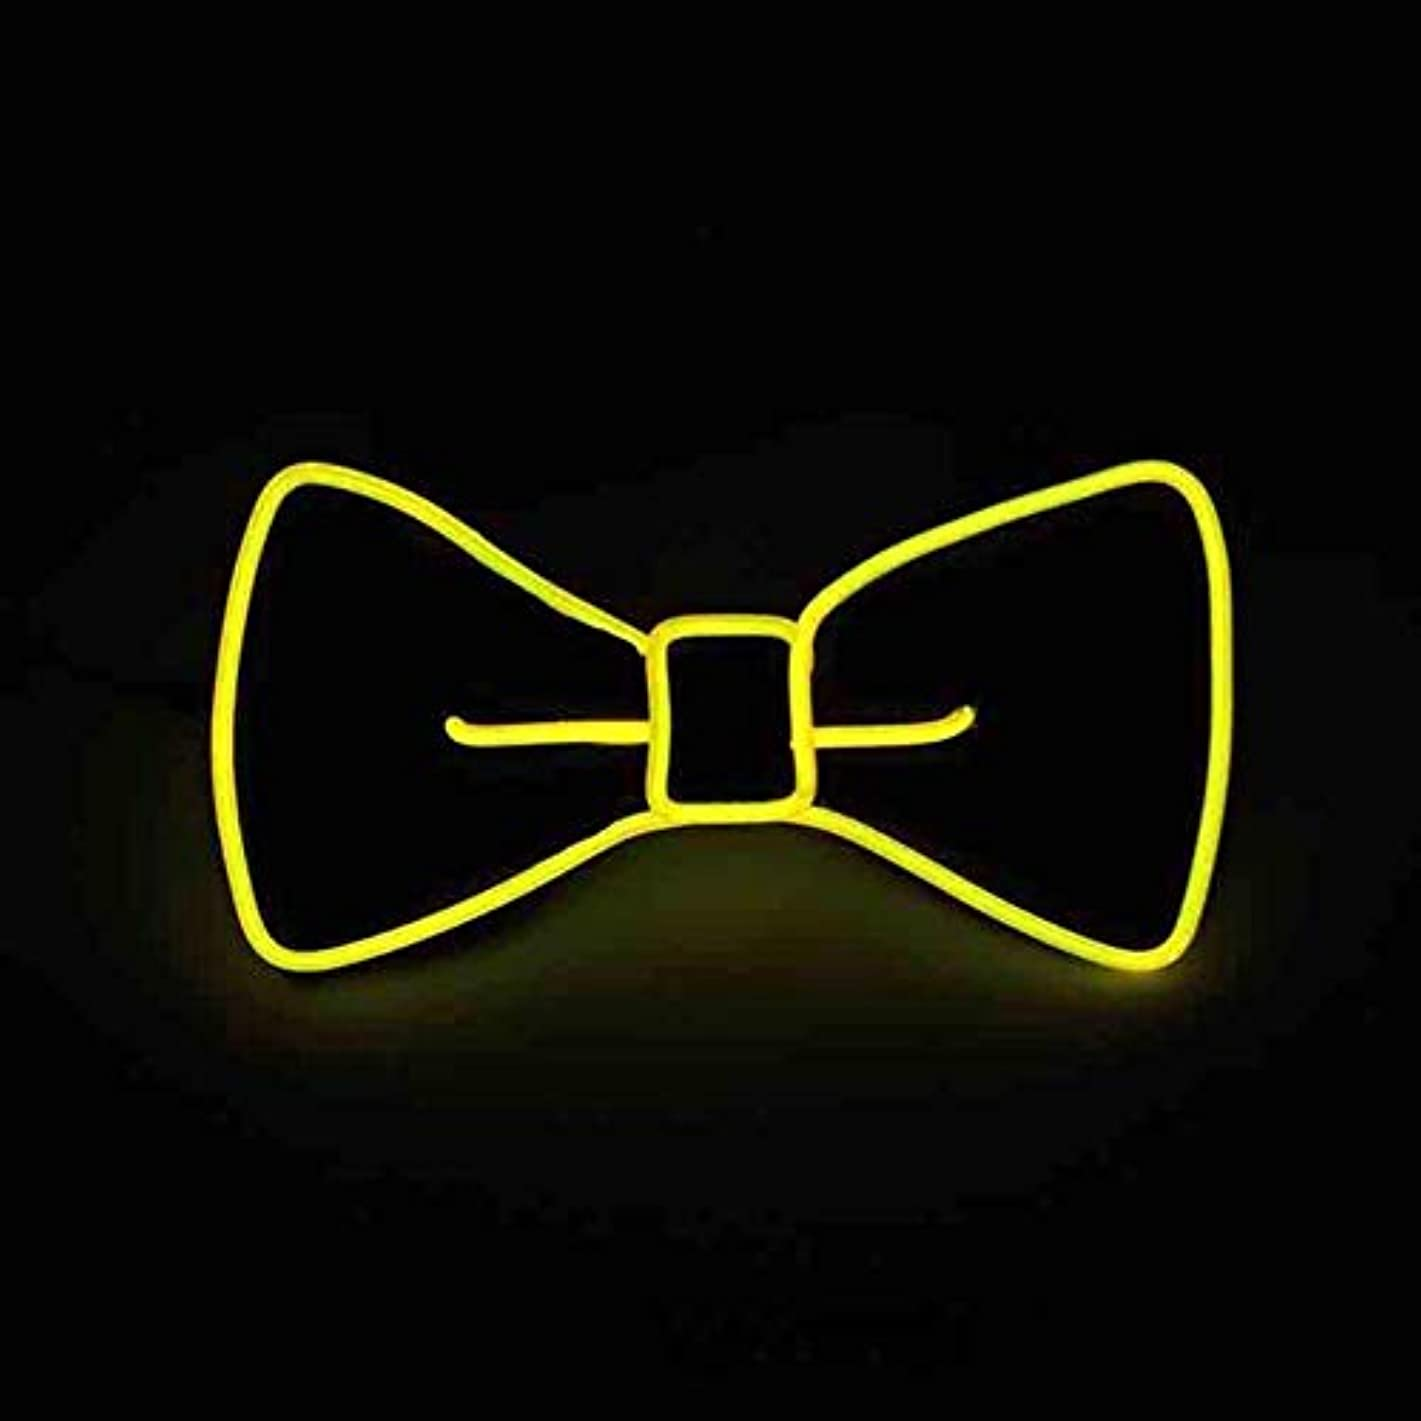 Glaray Luminous Bow Tie Novelty Adjustable EL Wire LED Light Up Glowing Bowtie